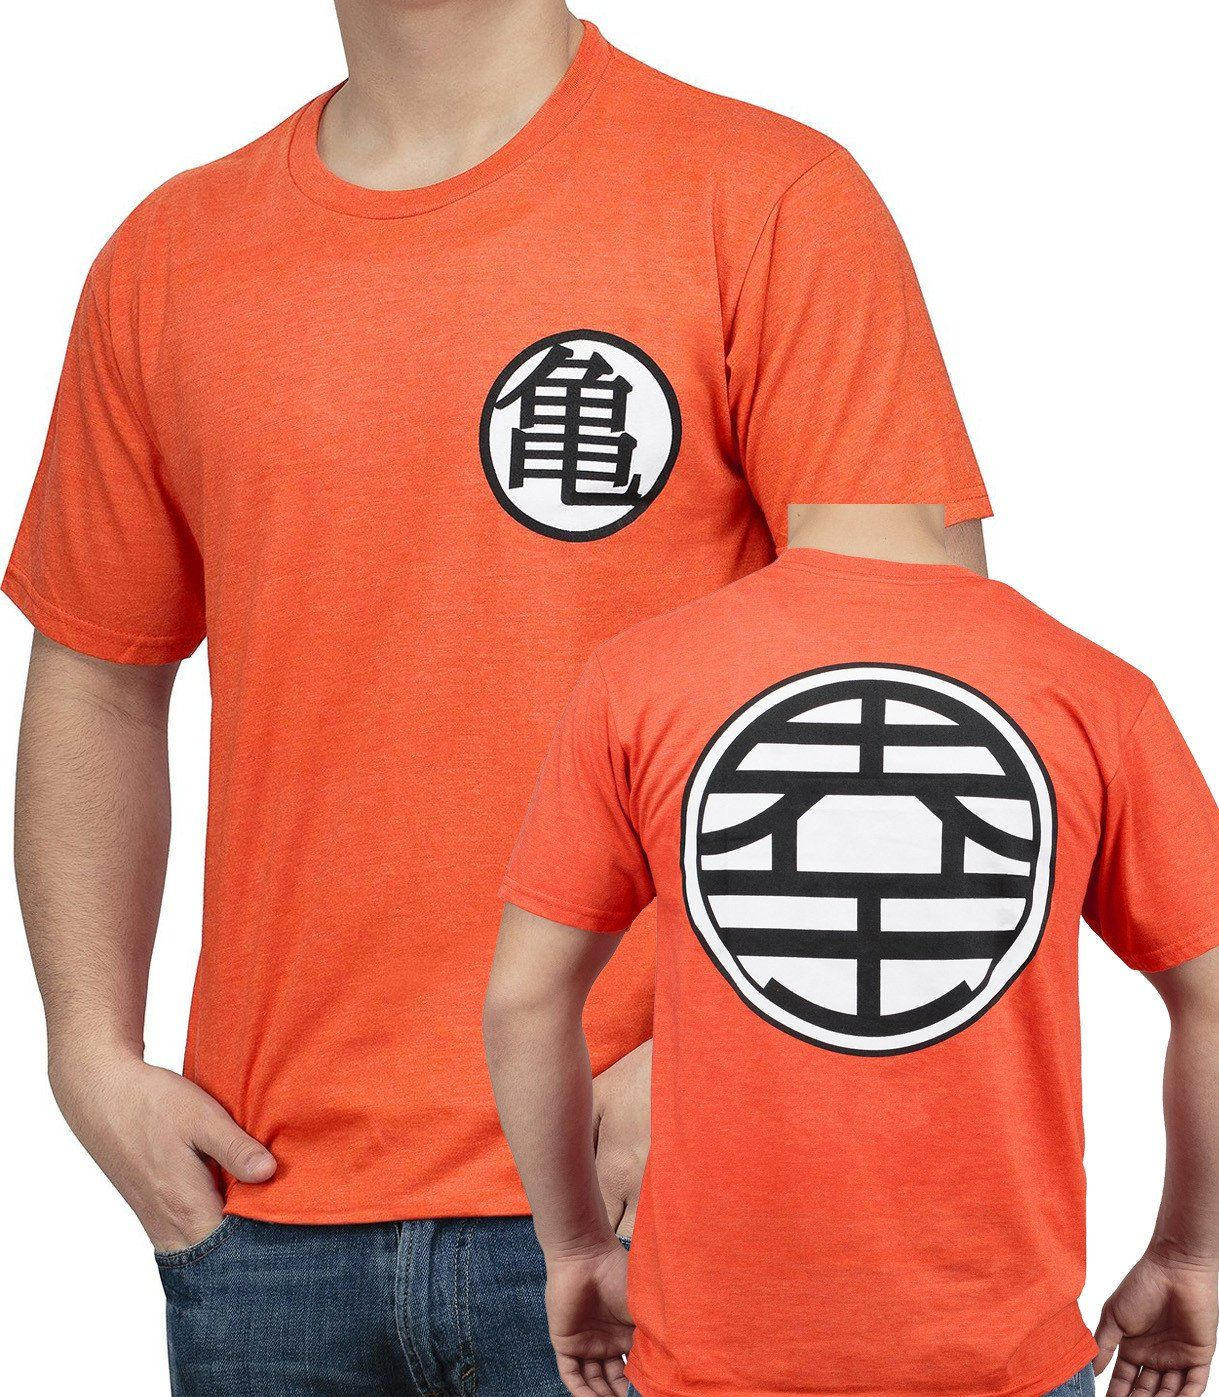 Dragon Ball Z Goku Kame Symbol T Shirt Otaku Forest Goku T Shirt Balls Clothes Dragon Ball Goku